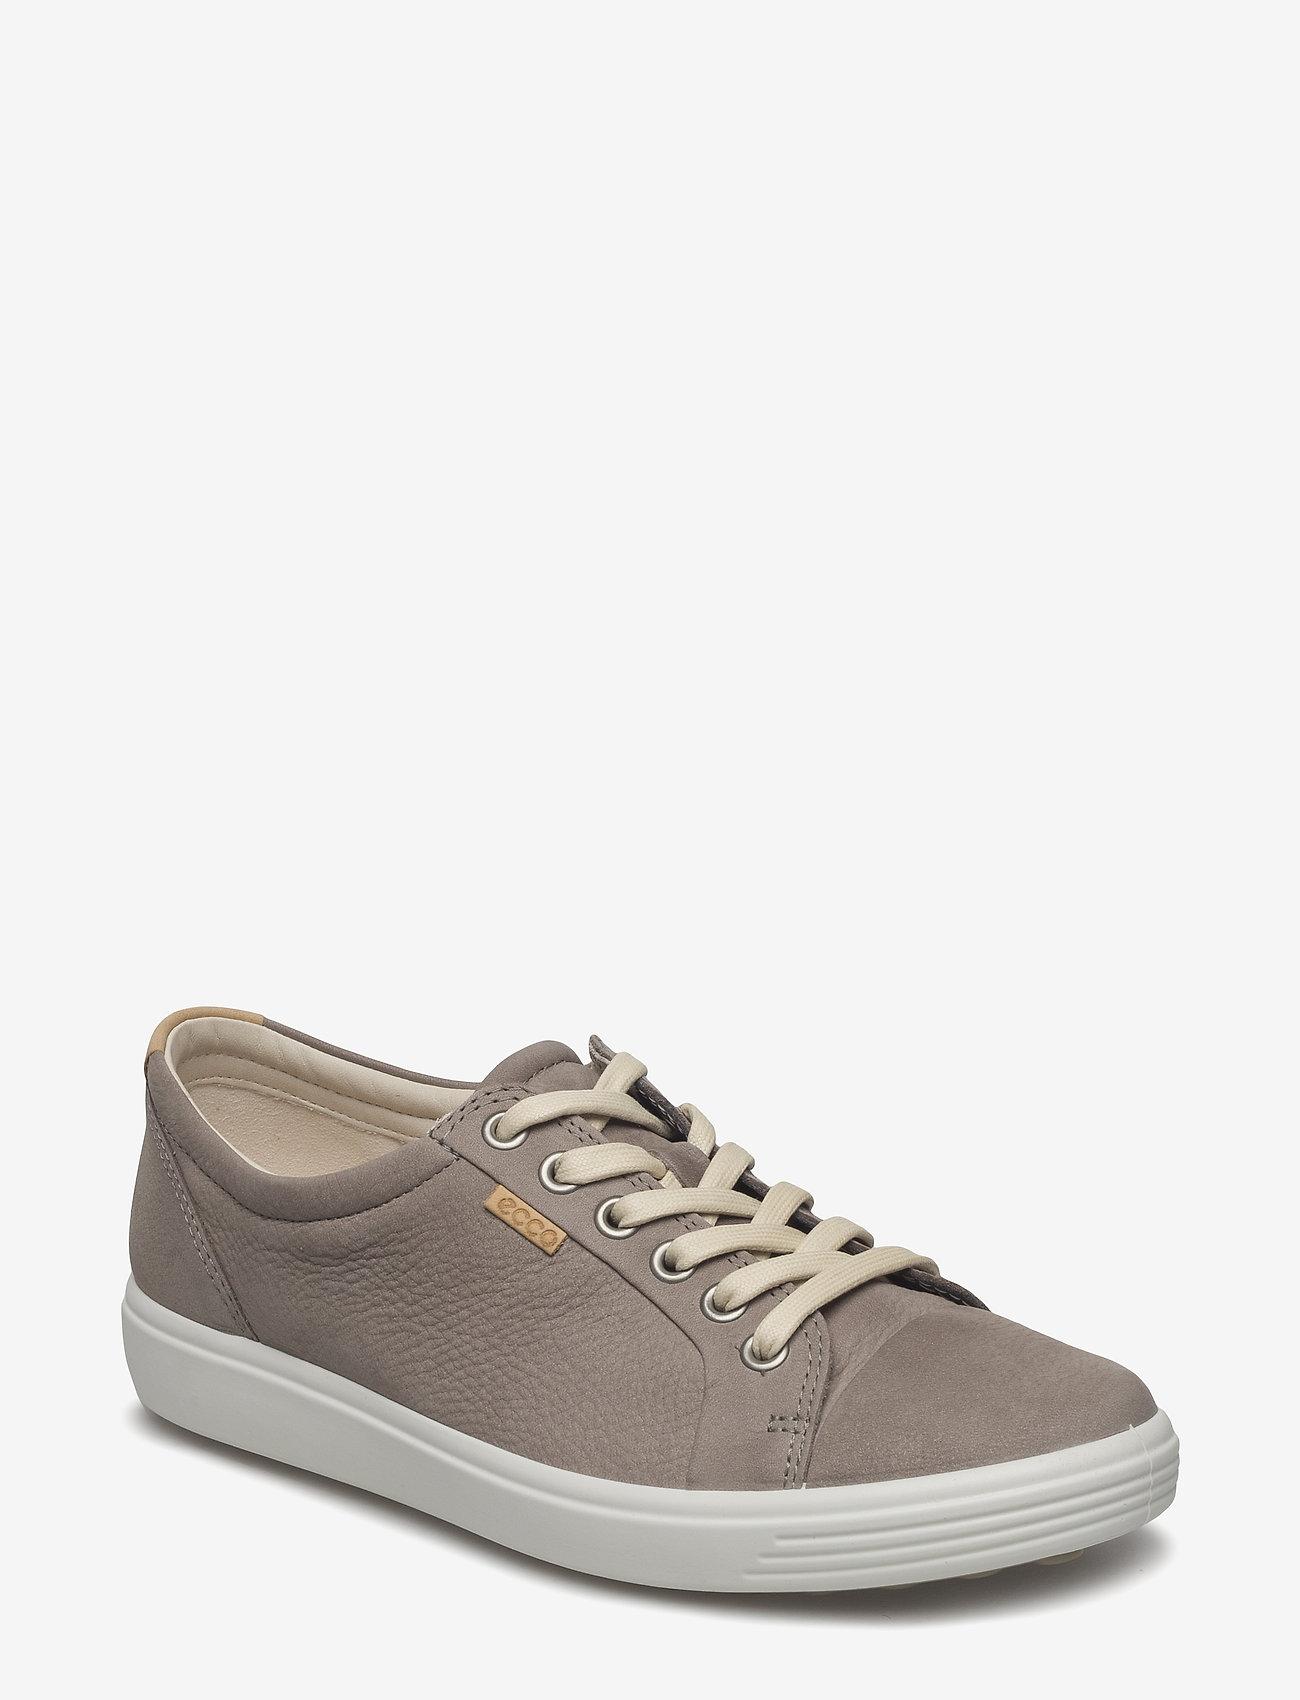 ECCO - SOFT 7 W - låga sneakers - warm grey - 0